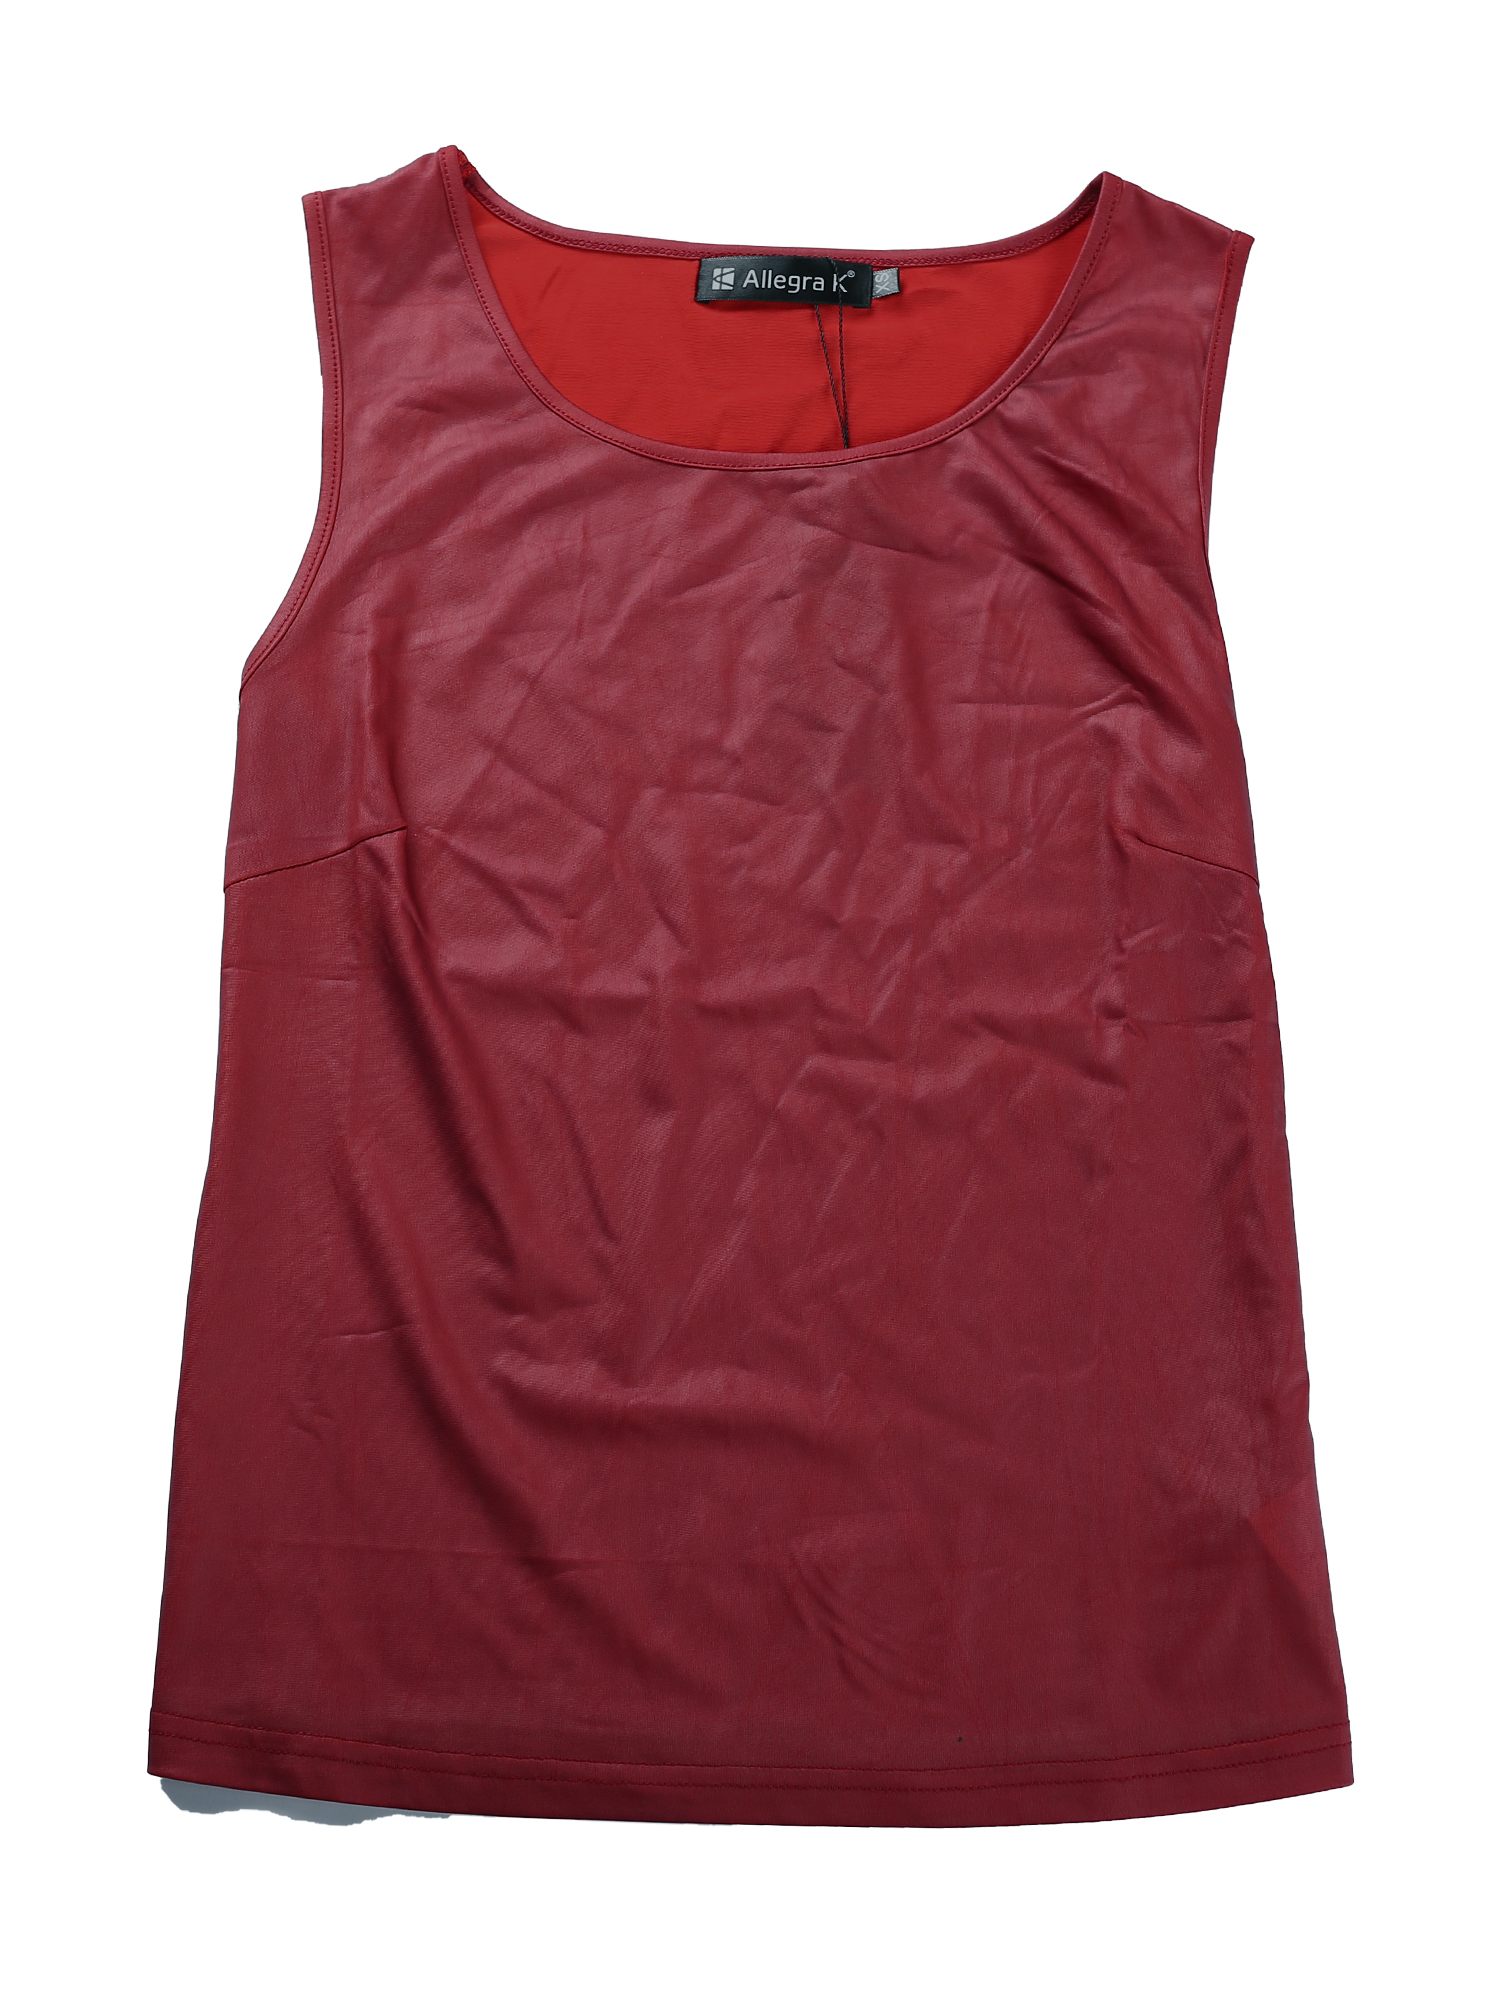 Woman U Neck Sleeveless Stretch Shiny Design Tank Top